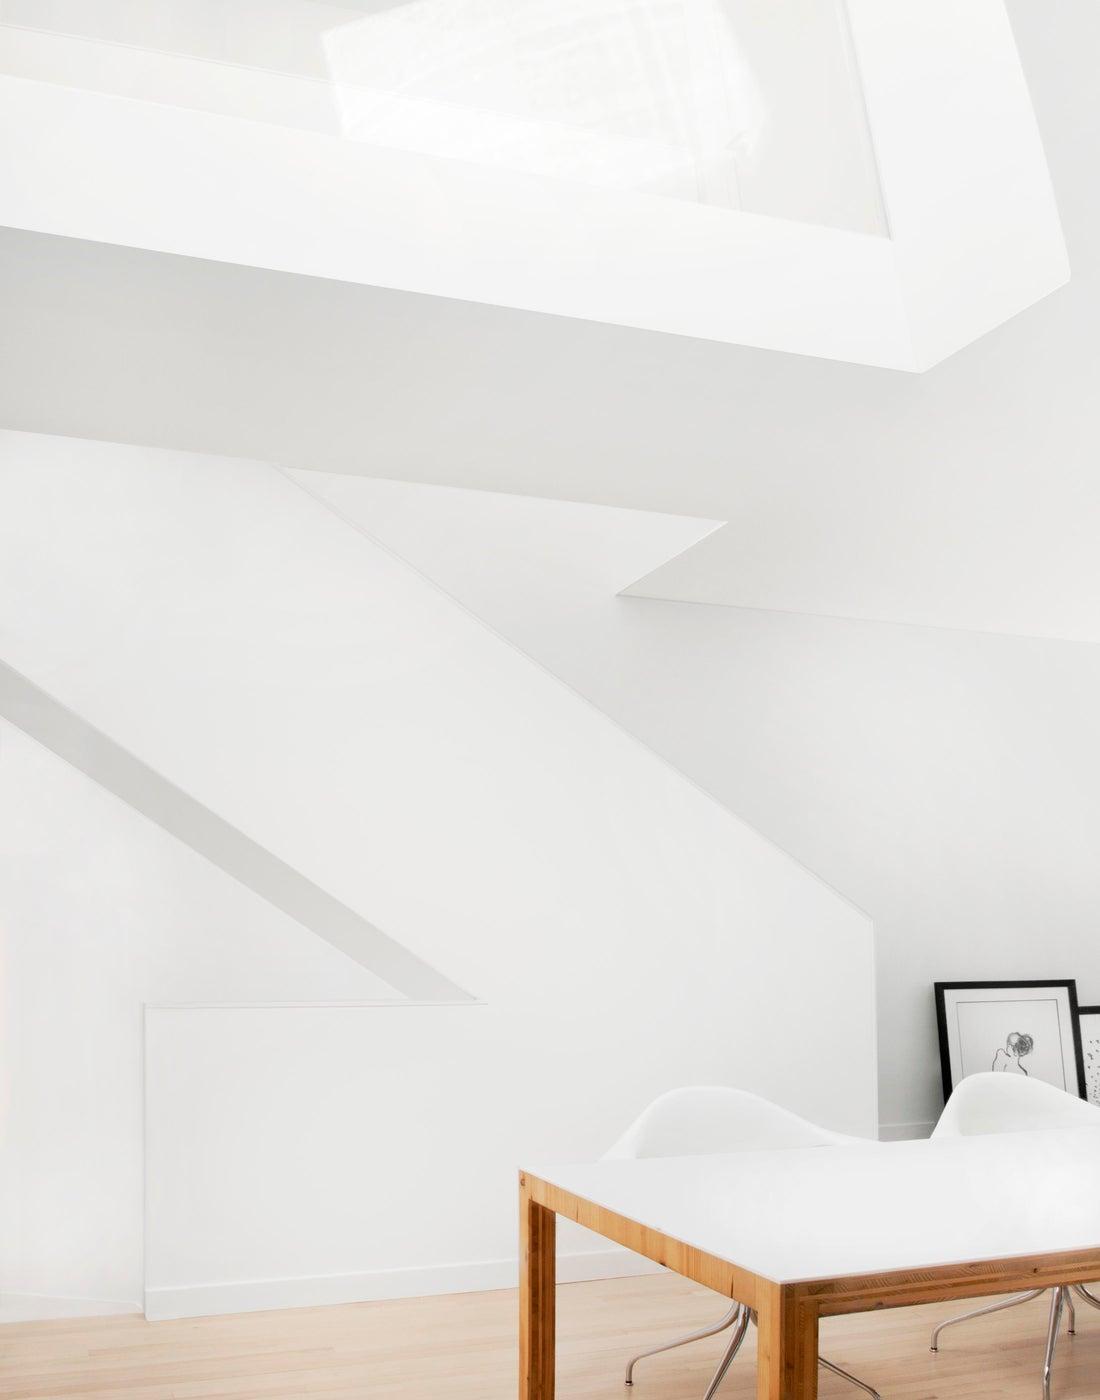 Glass Guard Rail at Stair under Skylight, Bright White Sunlight